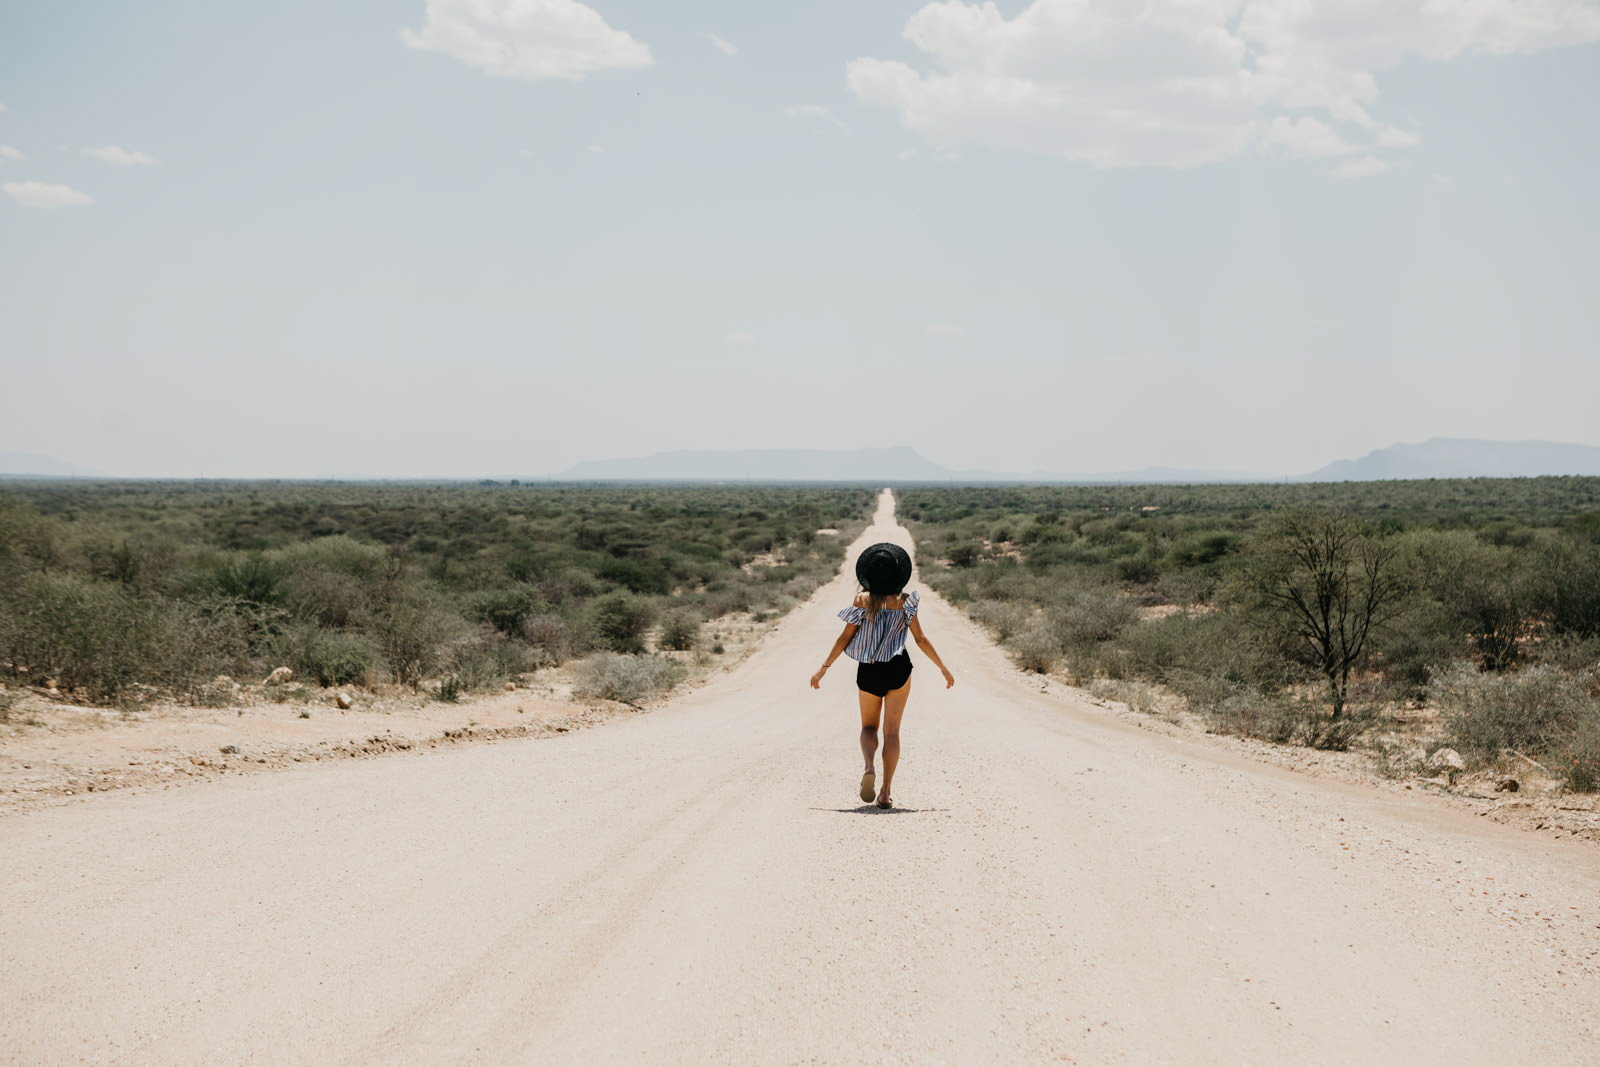 namibia_trip_rooftent_camping_roadtrip (1 von 18).jpg